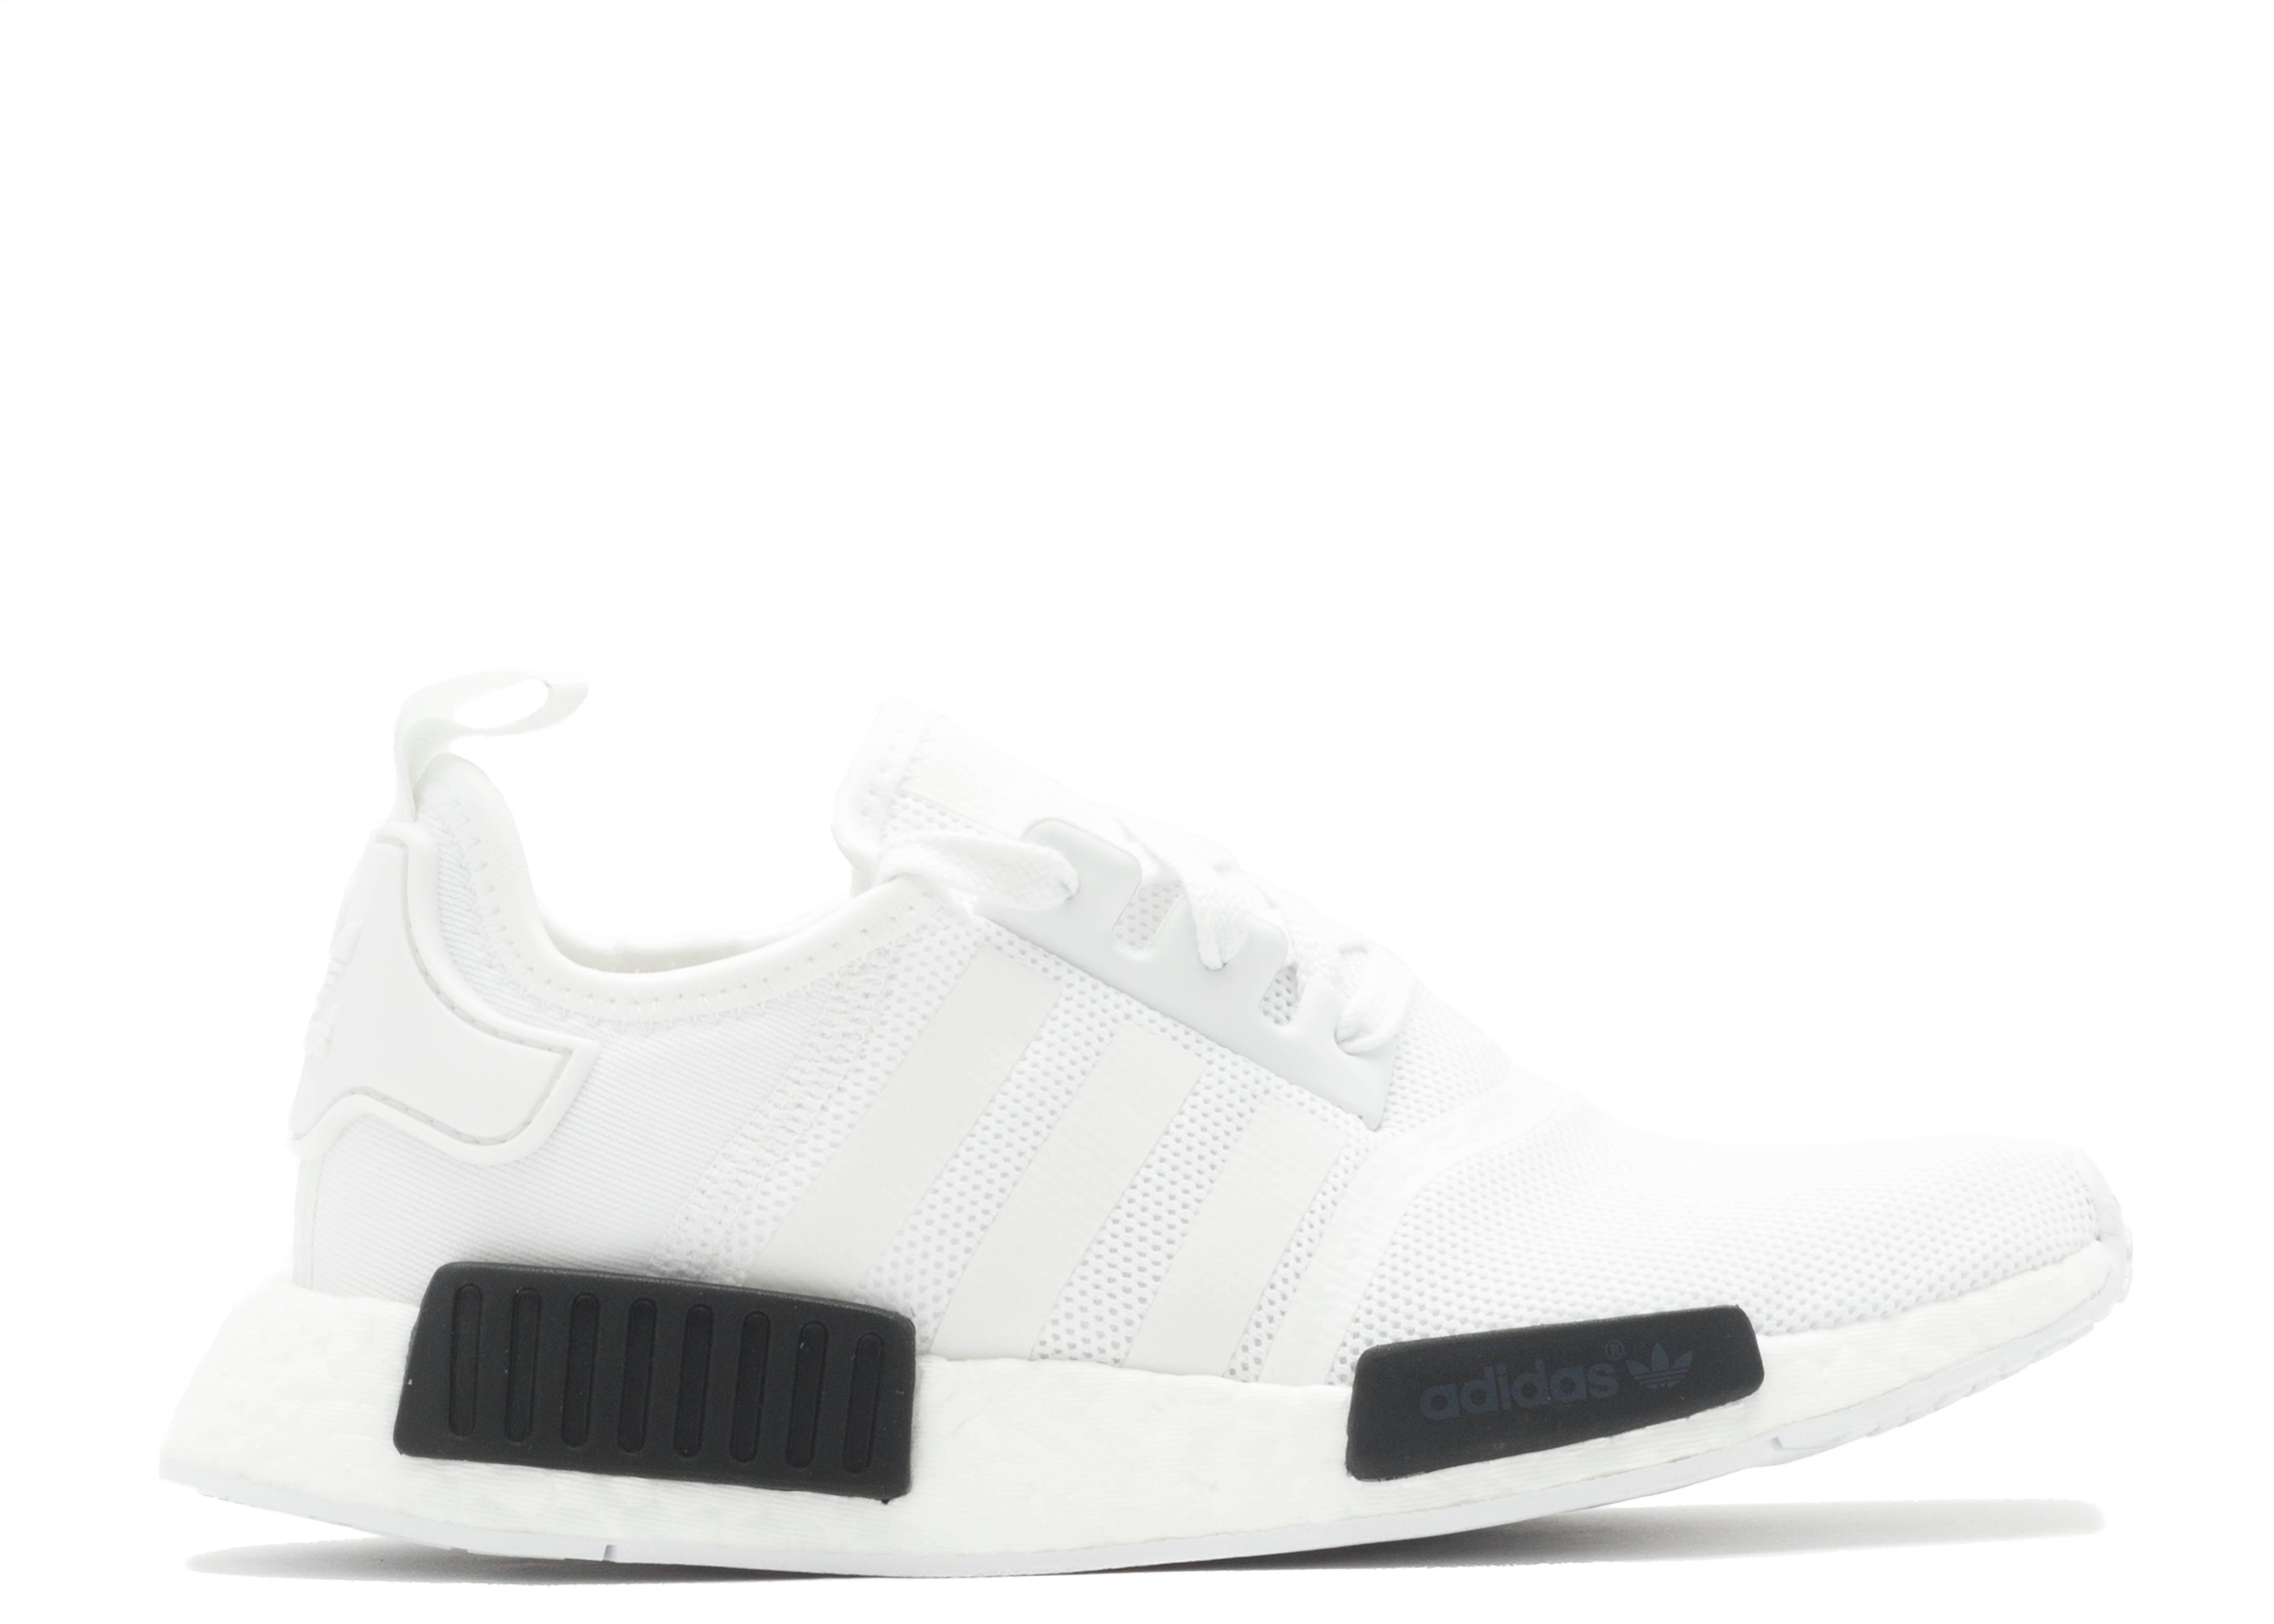 pretty nice 82ade aee14 greece adidas nmd runner svart and hvit 712f0 0d2c4